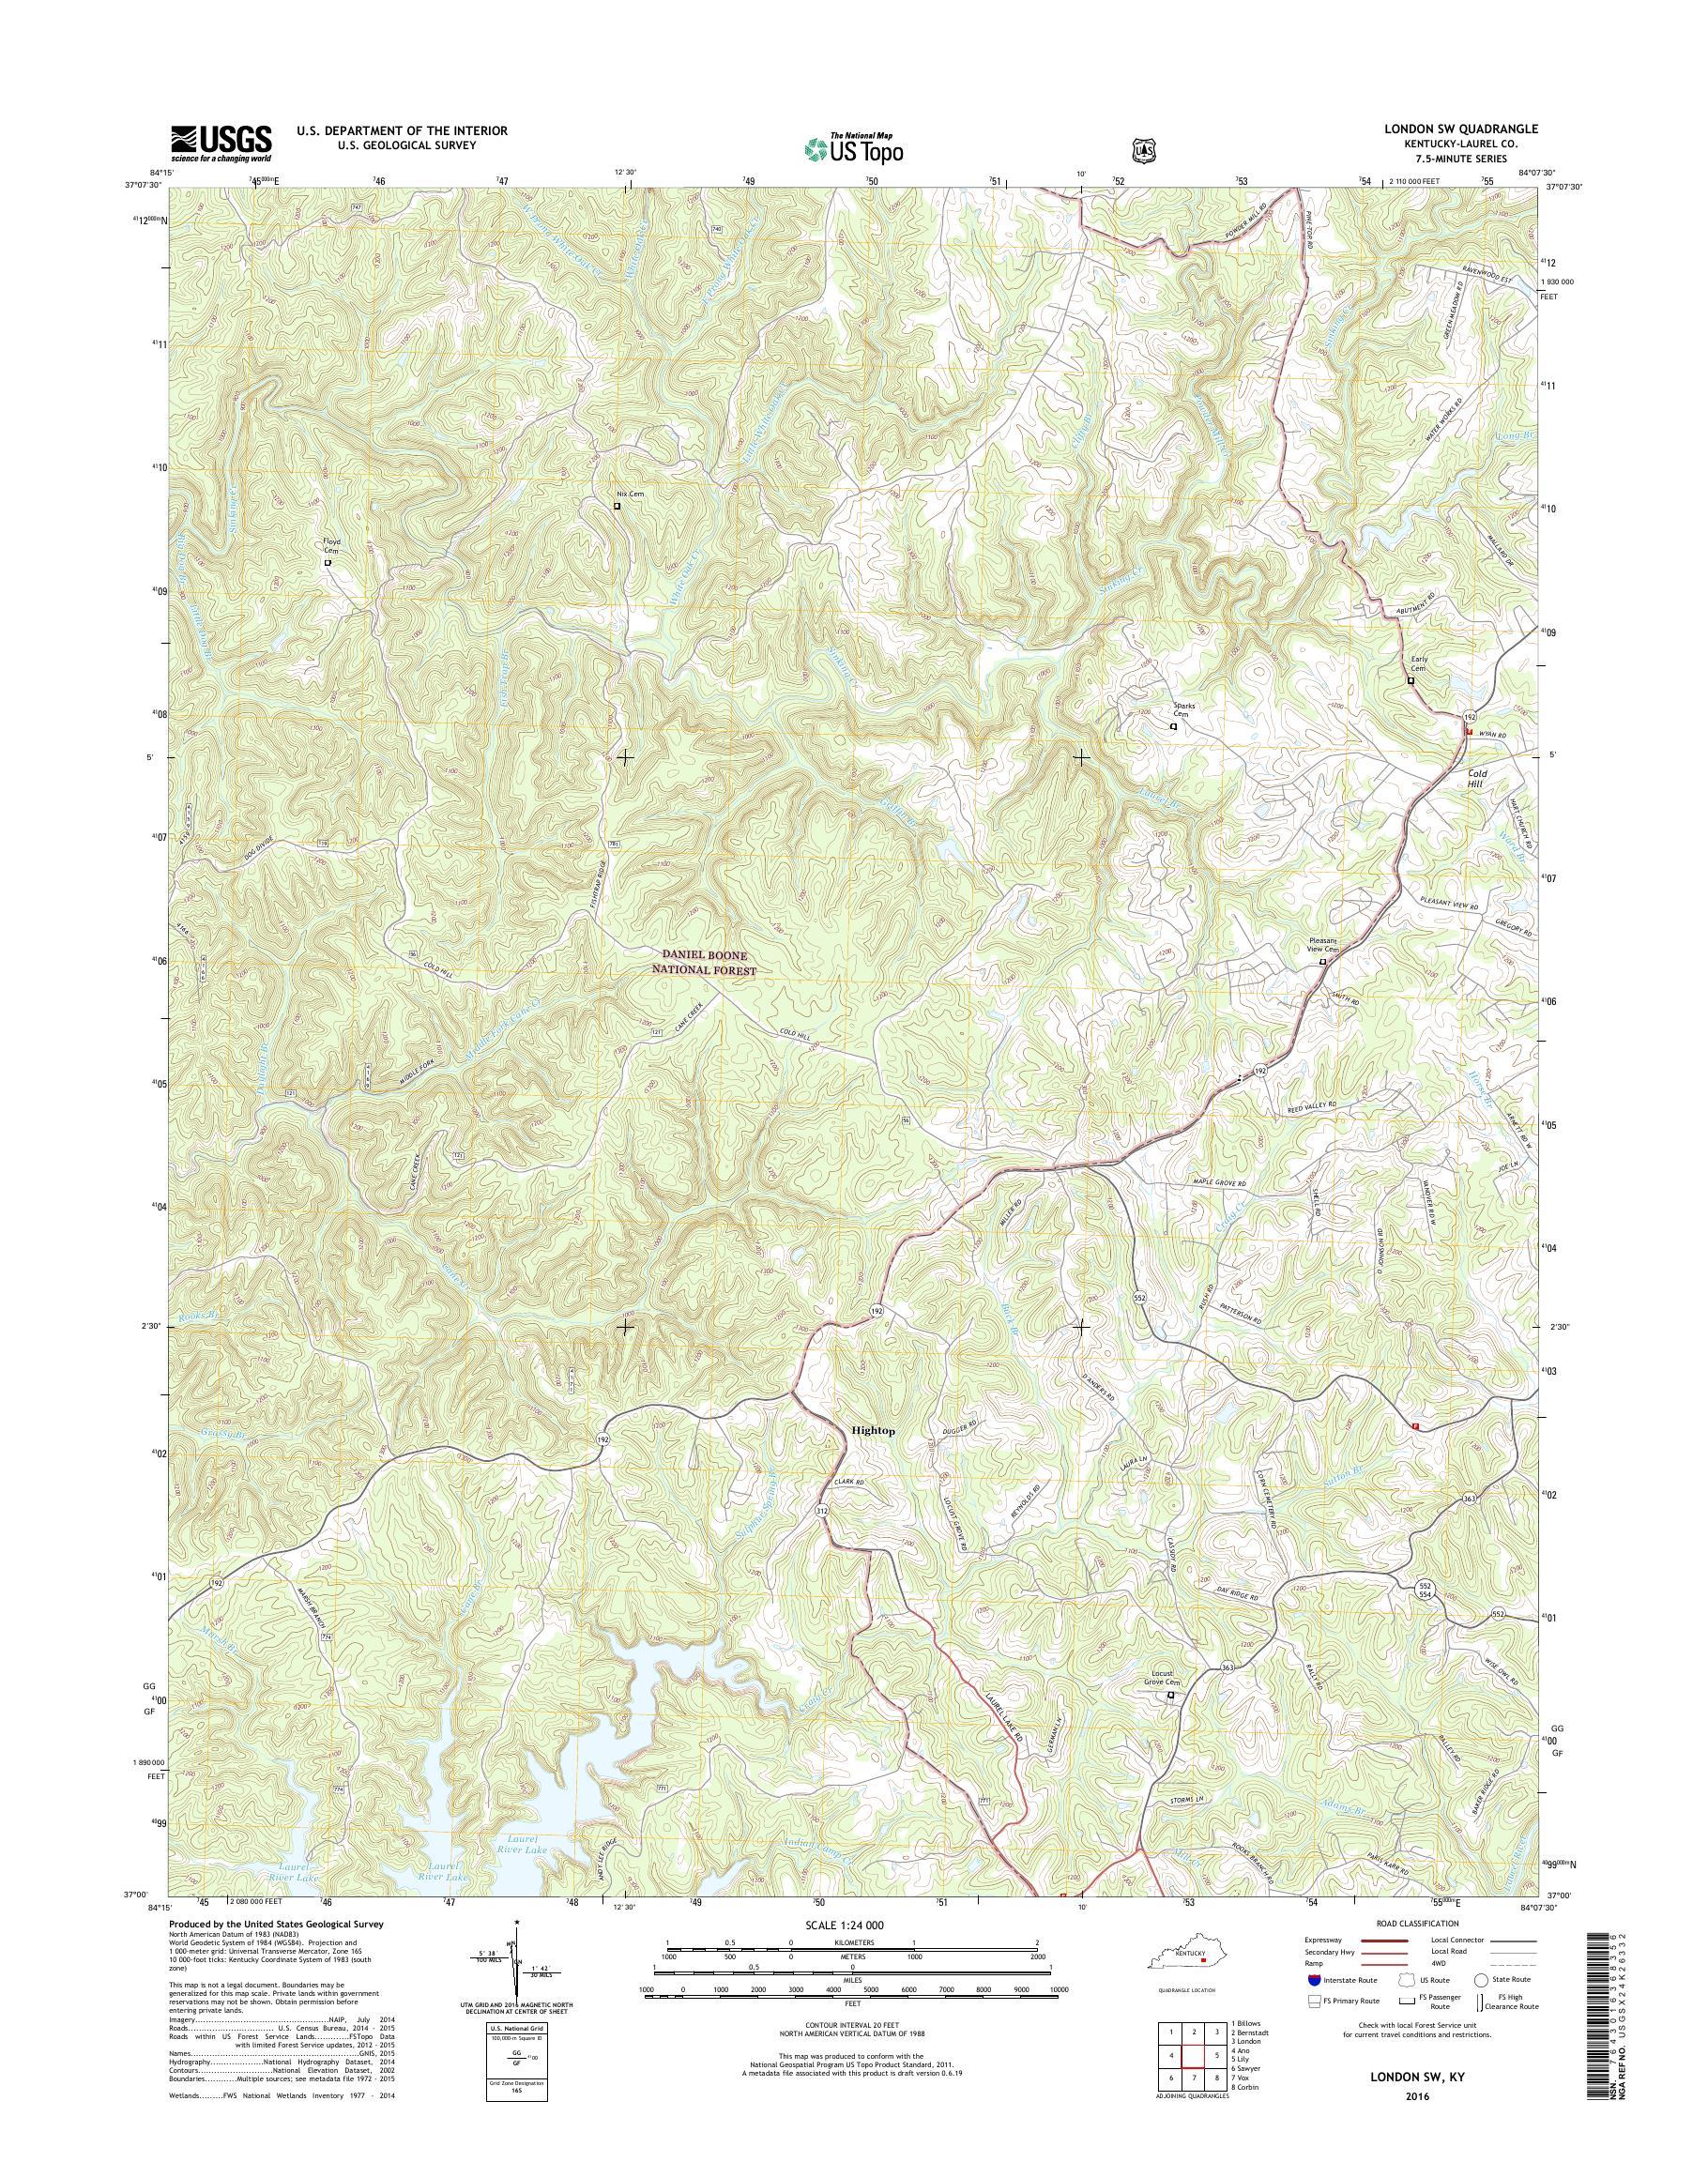 London Sw Map.Mytopo London Sw Kentucky Usgs Quad Topo Map